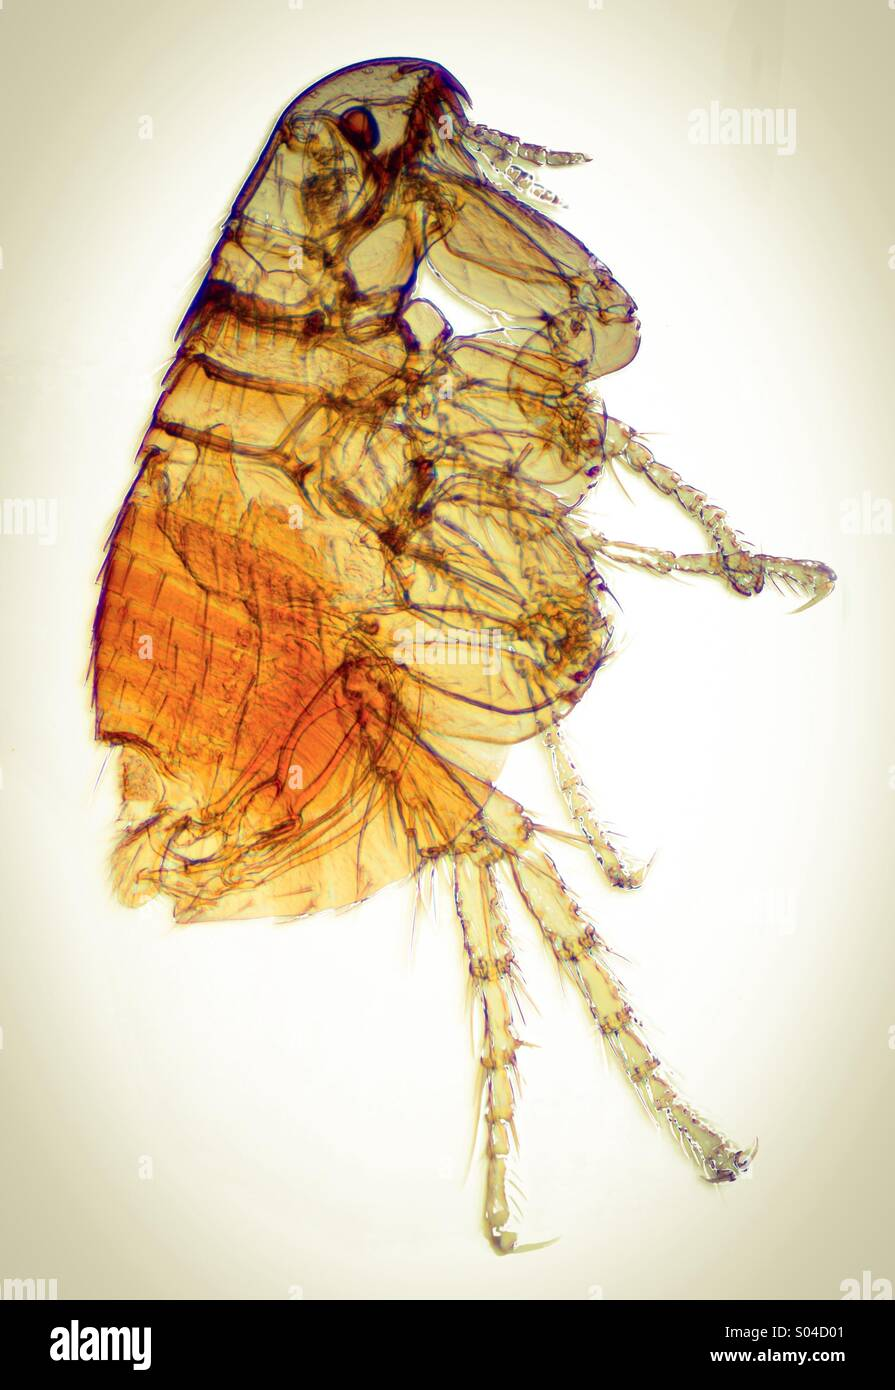 flea-S04D01.jpg